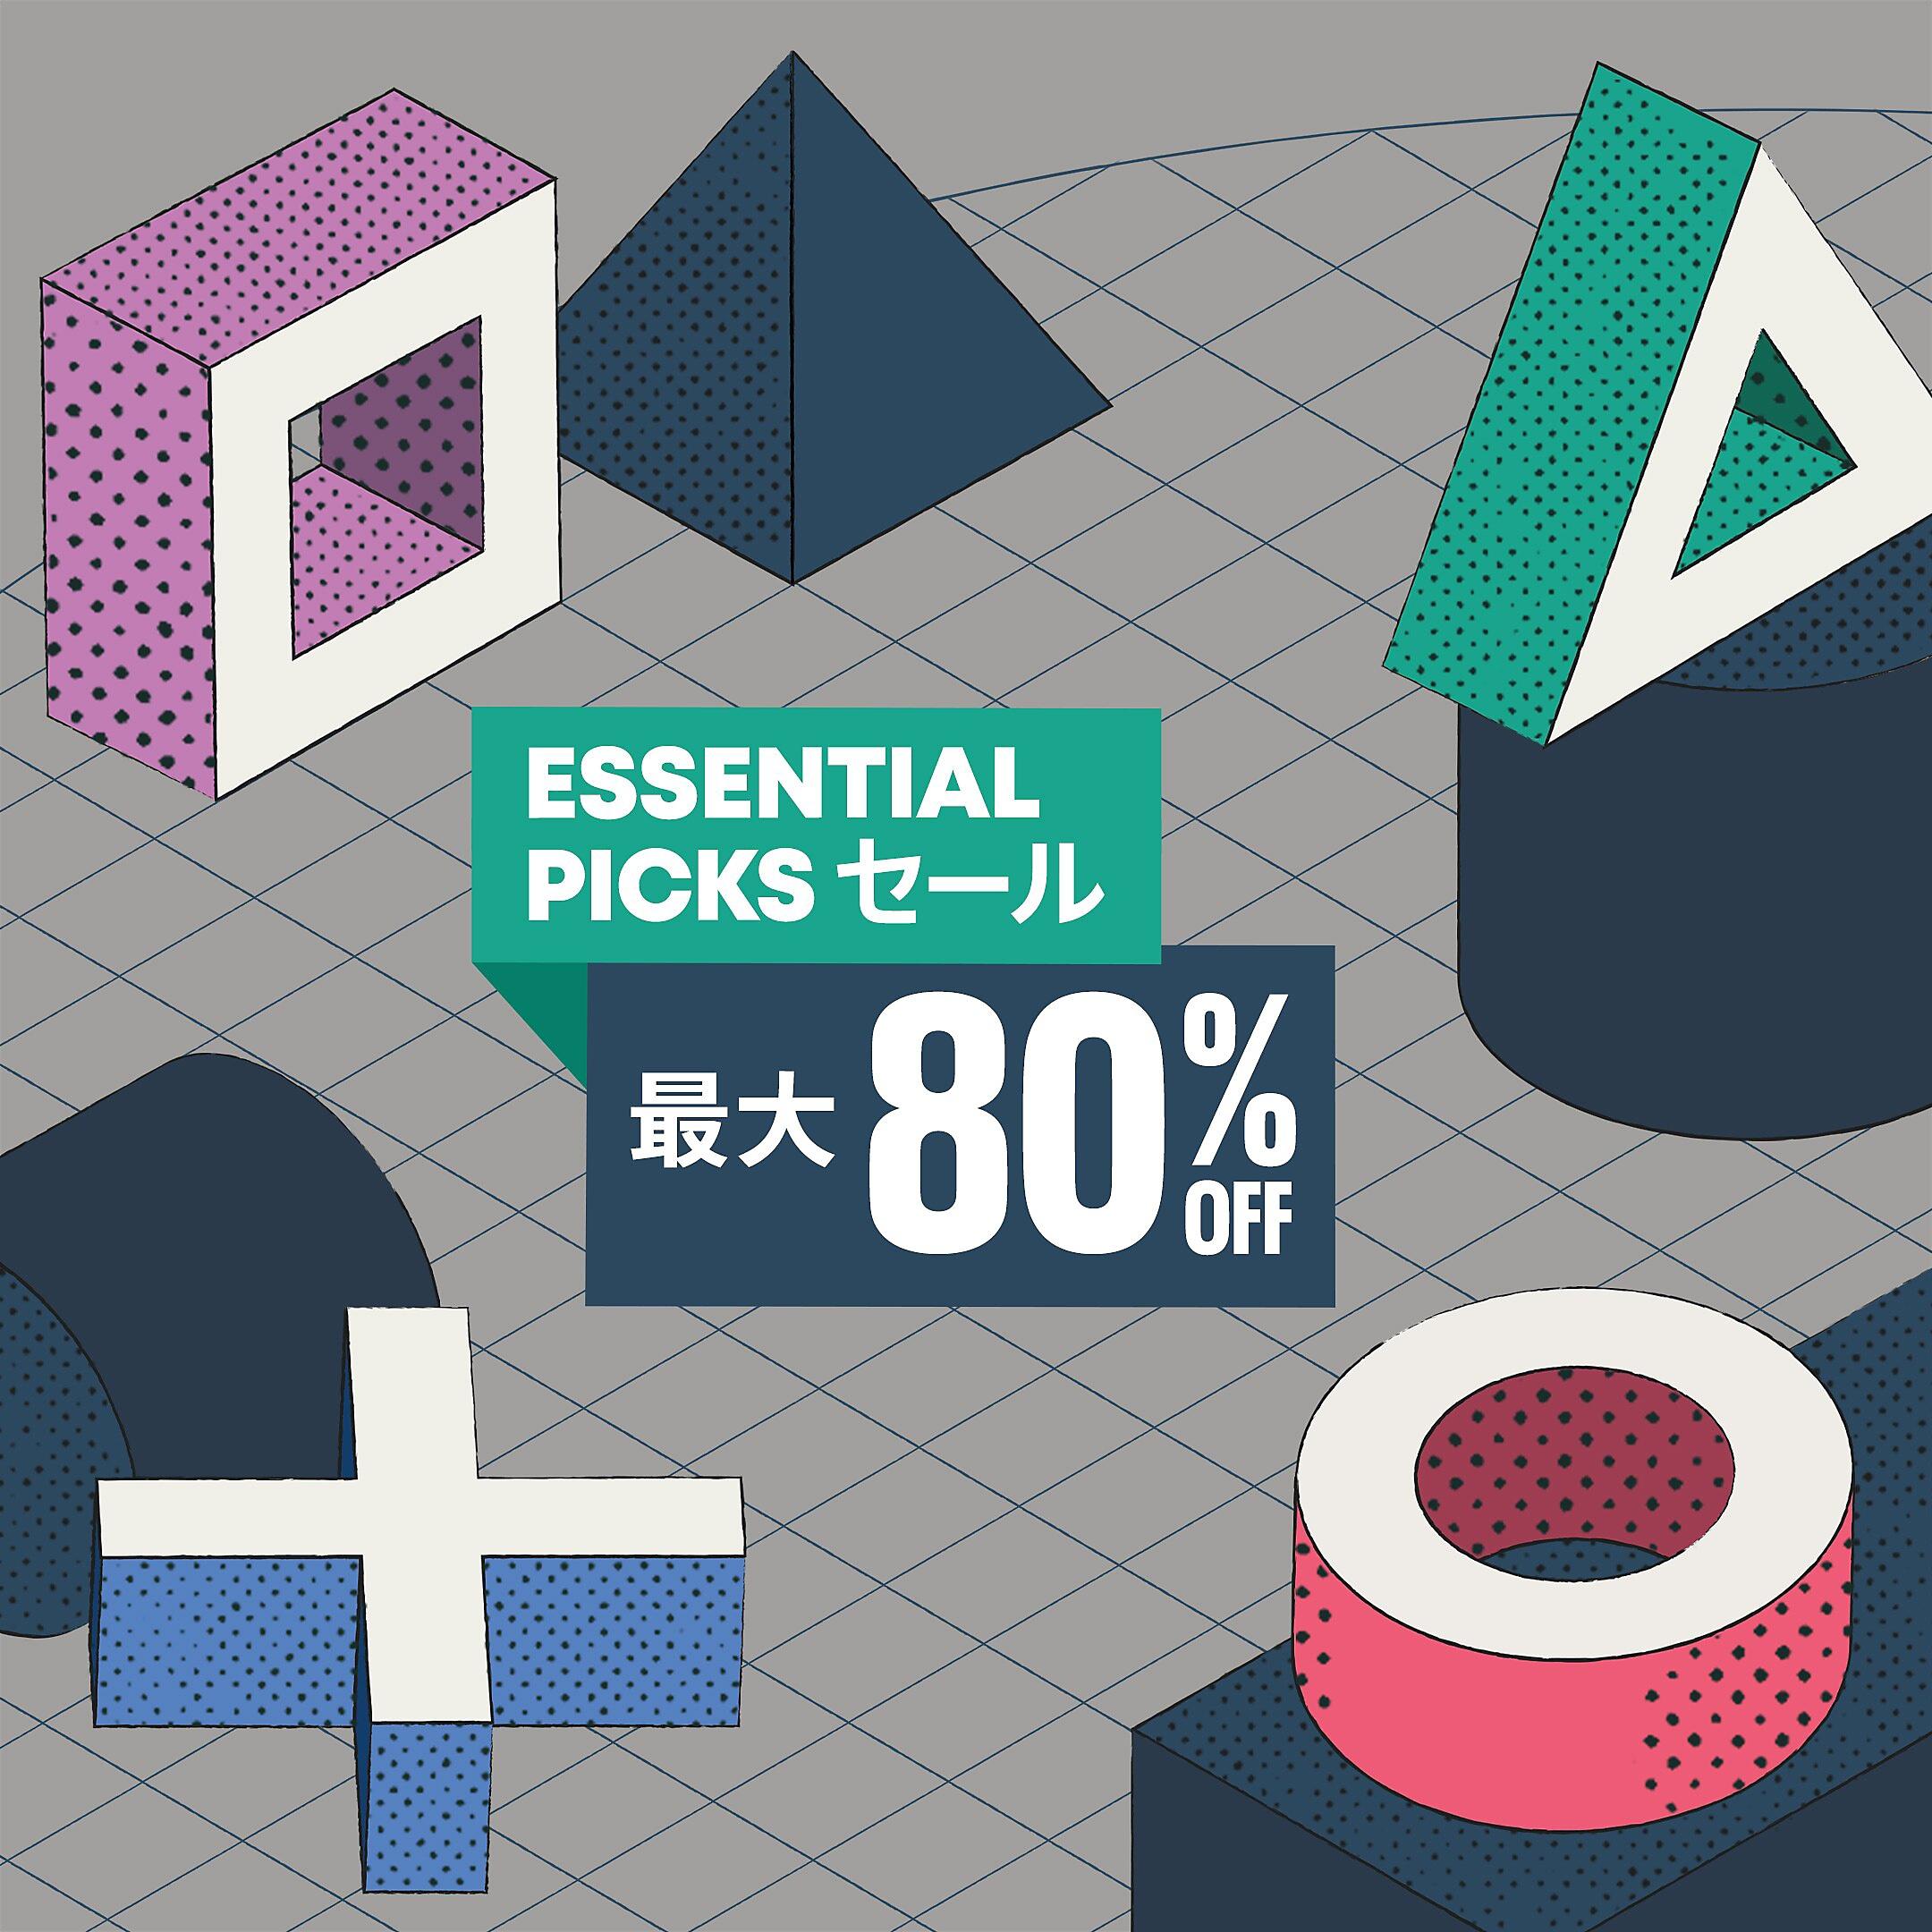 Essential Picks Sale